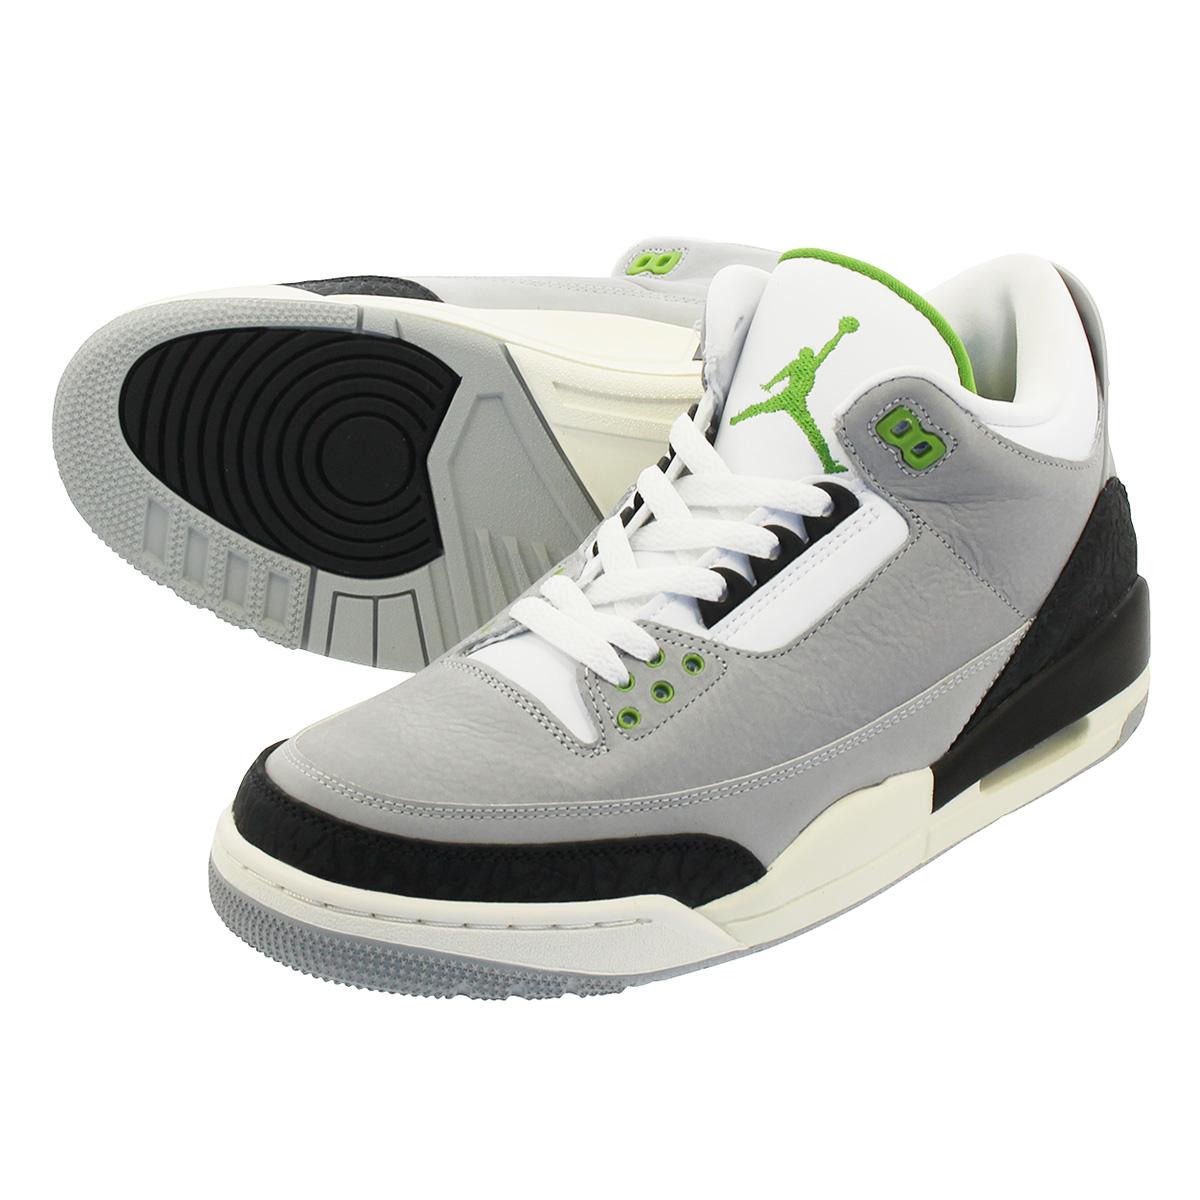 NIKE AIR JORDAN 3 RETRO Nike Air Jordan 3 nostalgic LIGHT SMOKE  GREY CHLOROPHYLL BLACK WHITE 136 a06e25370b5